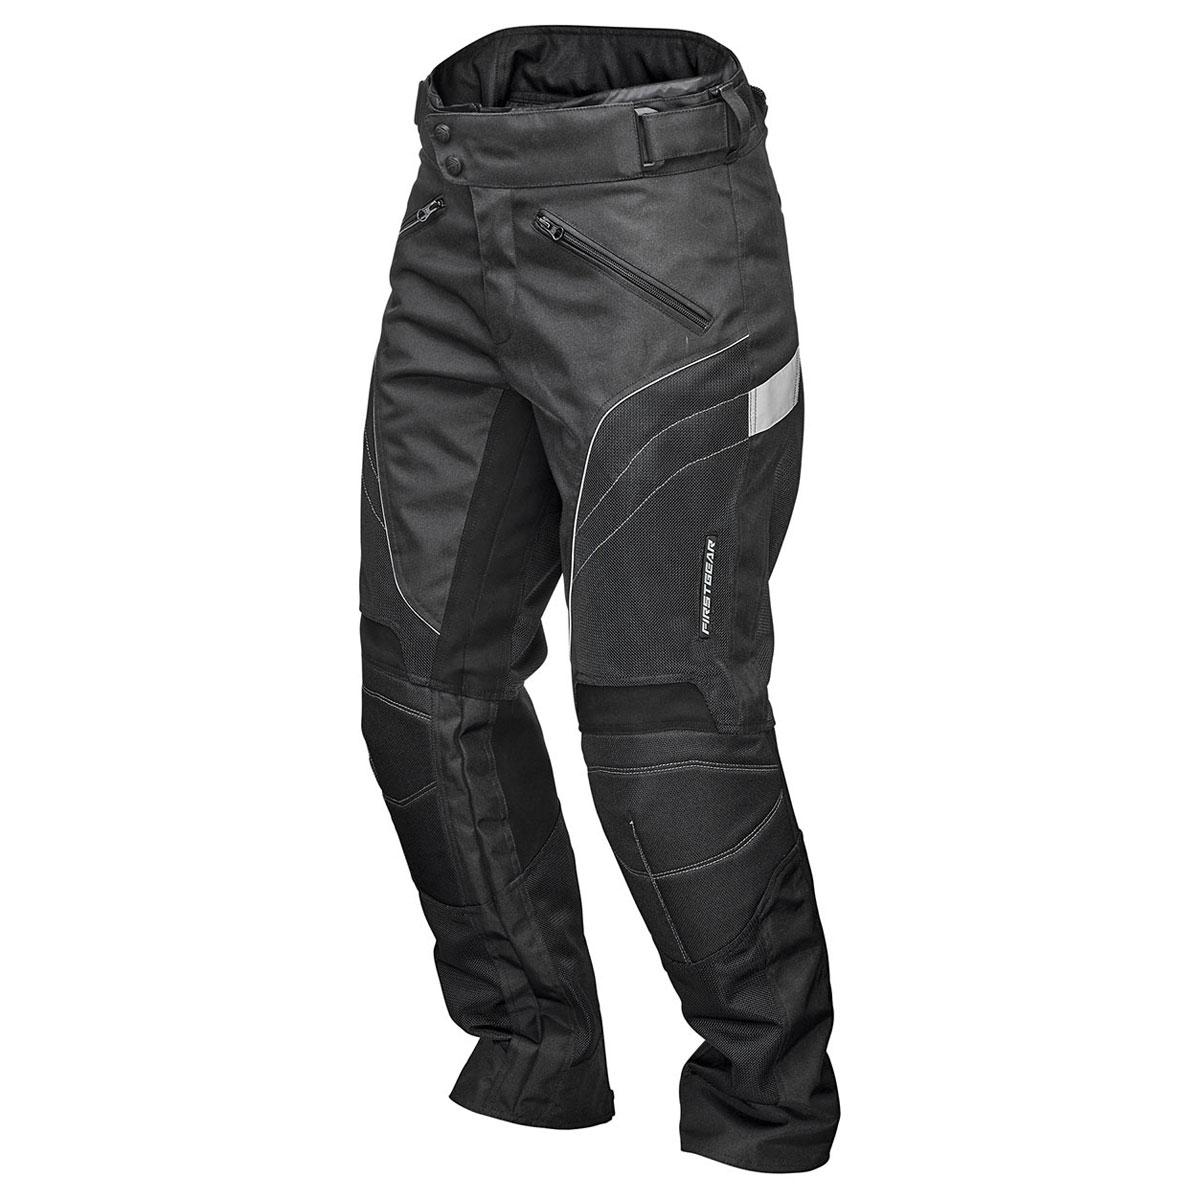 Firstgear Women's Contour Air Mesh Black Pants